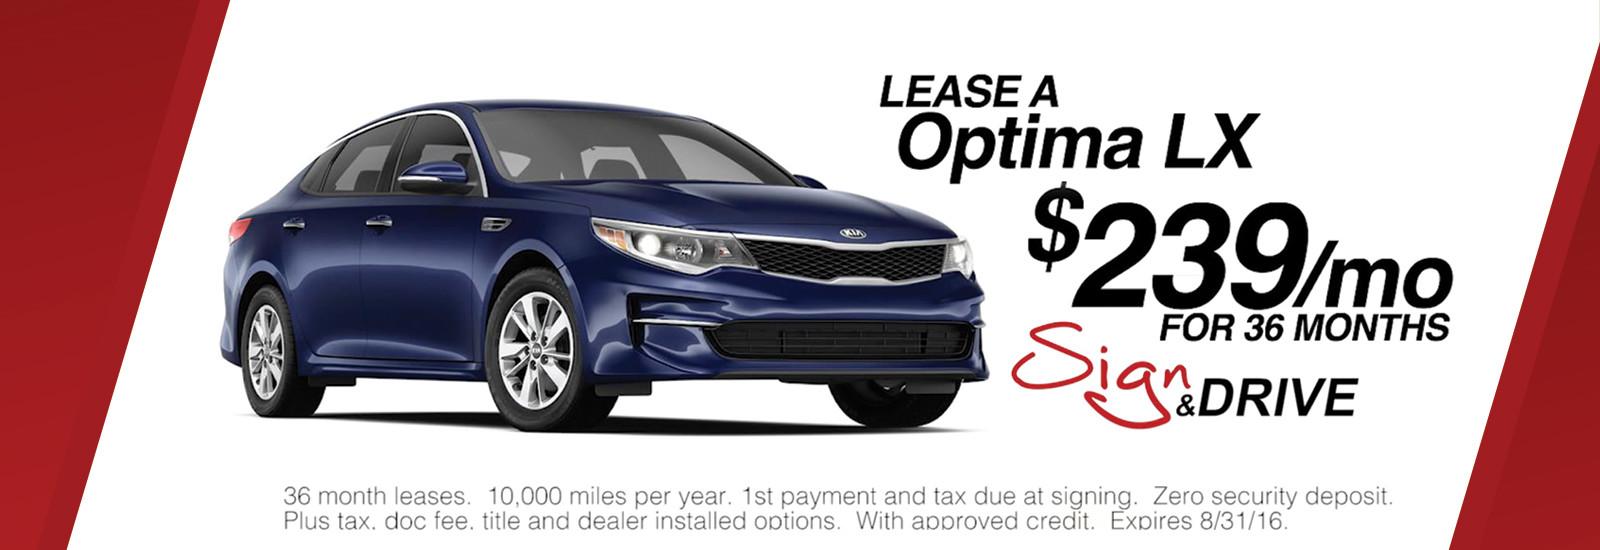 Optima Sign & Drive $239/mo